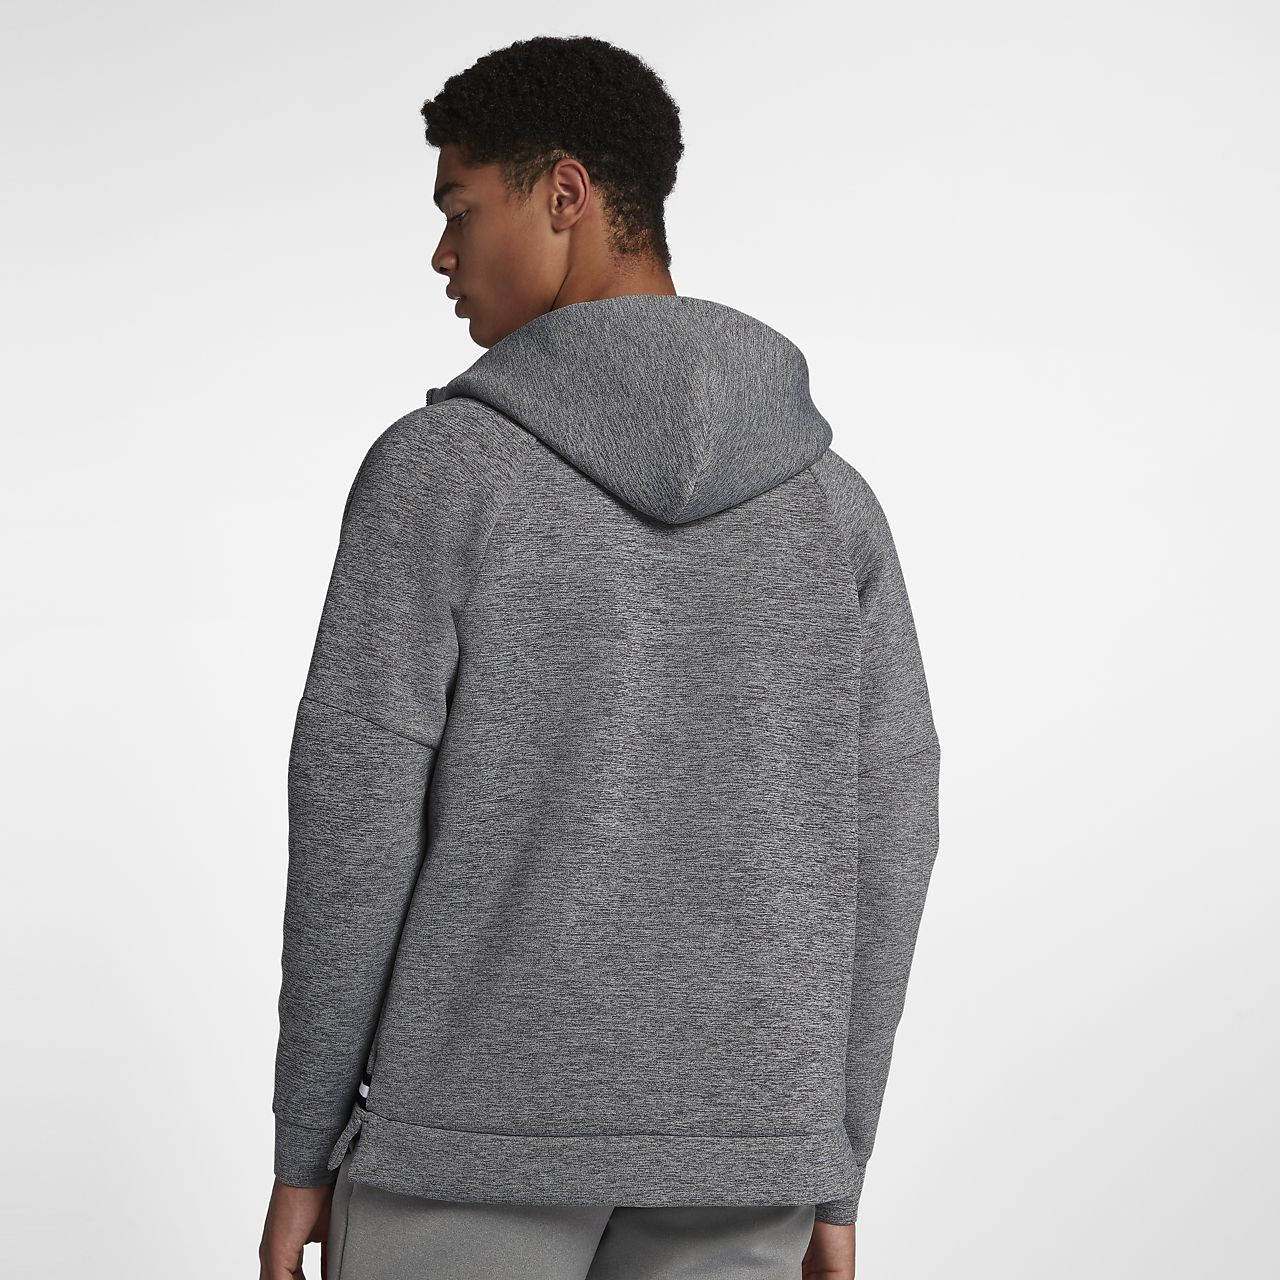 6e62c08d42a172 Jordan Sportswear Flight Tech Men s Full-Zip Hoodie. Nike.com